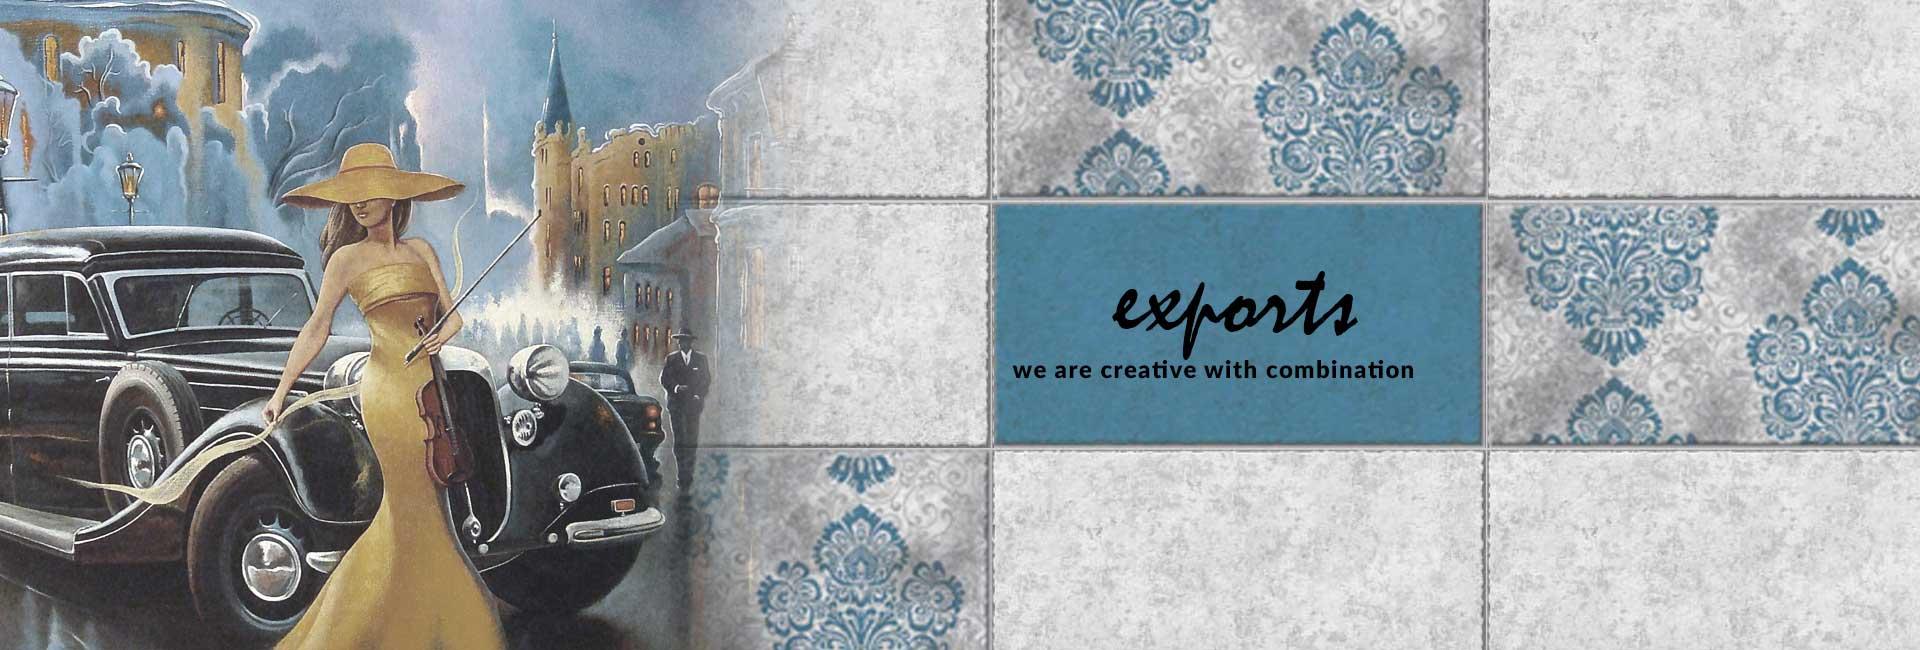 Premium Quality Digital Wall Tiles Exporter in India | Q-BO Digital ...